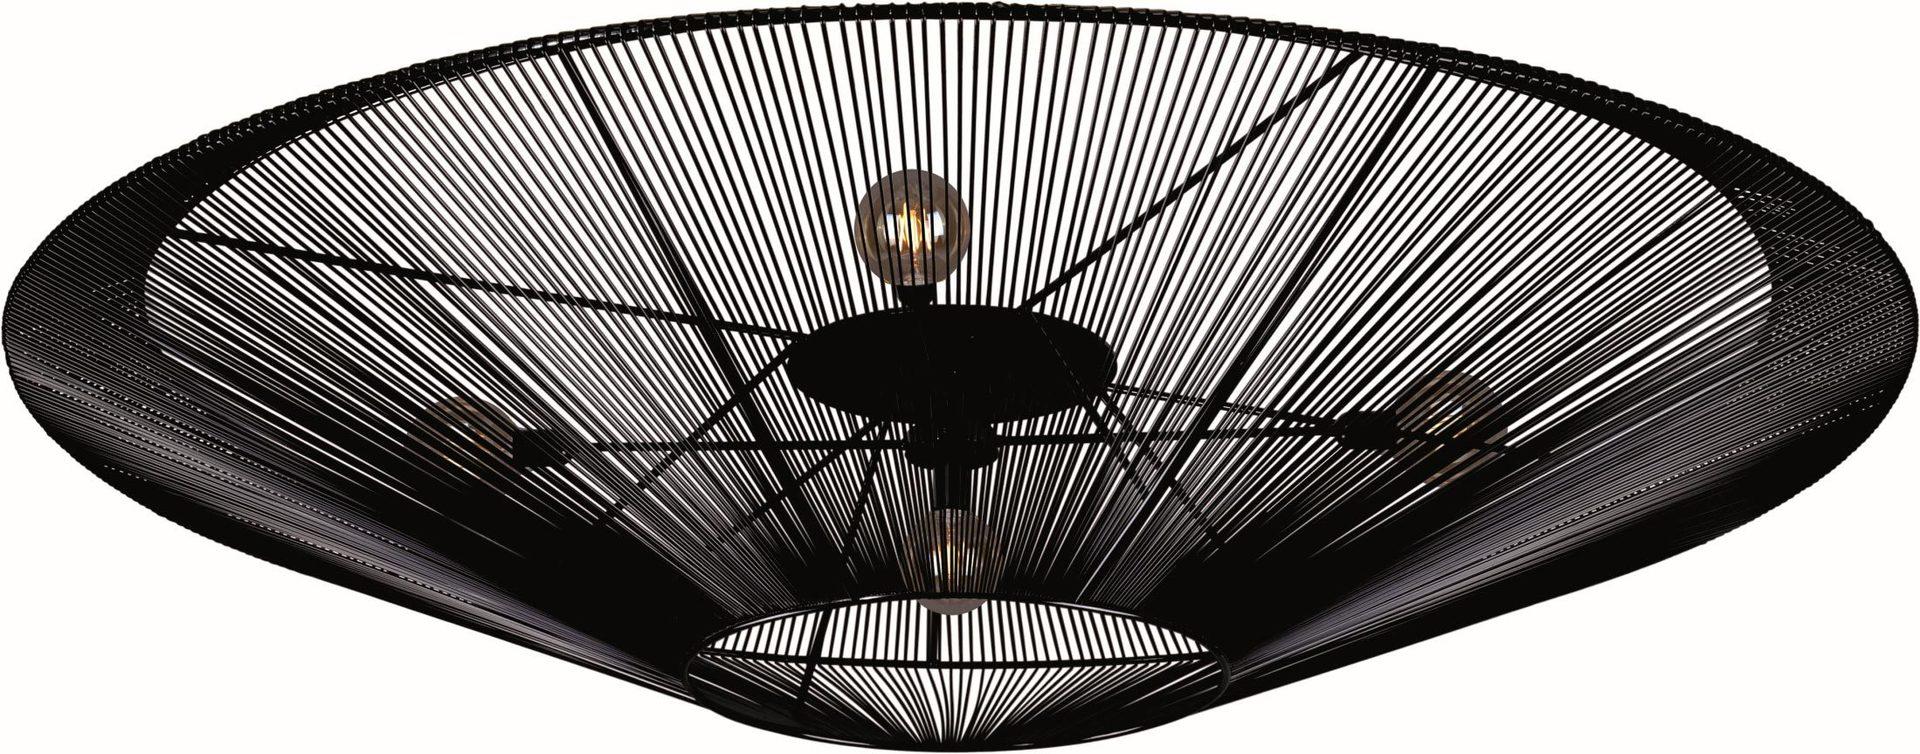 Lampa sufitowa KP-04 z serii CORNET